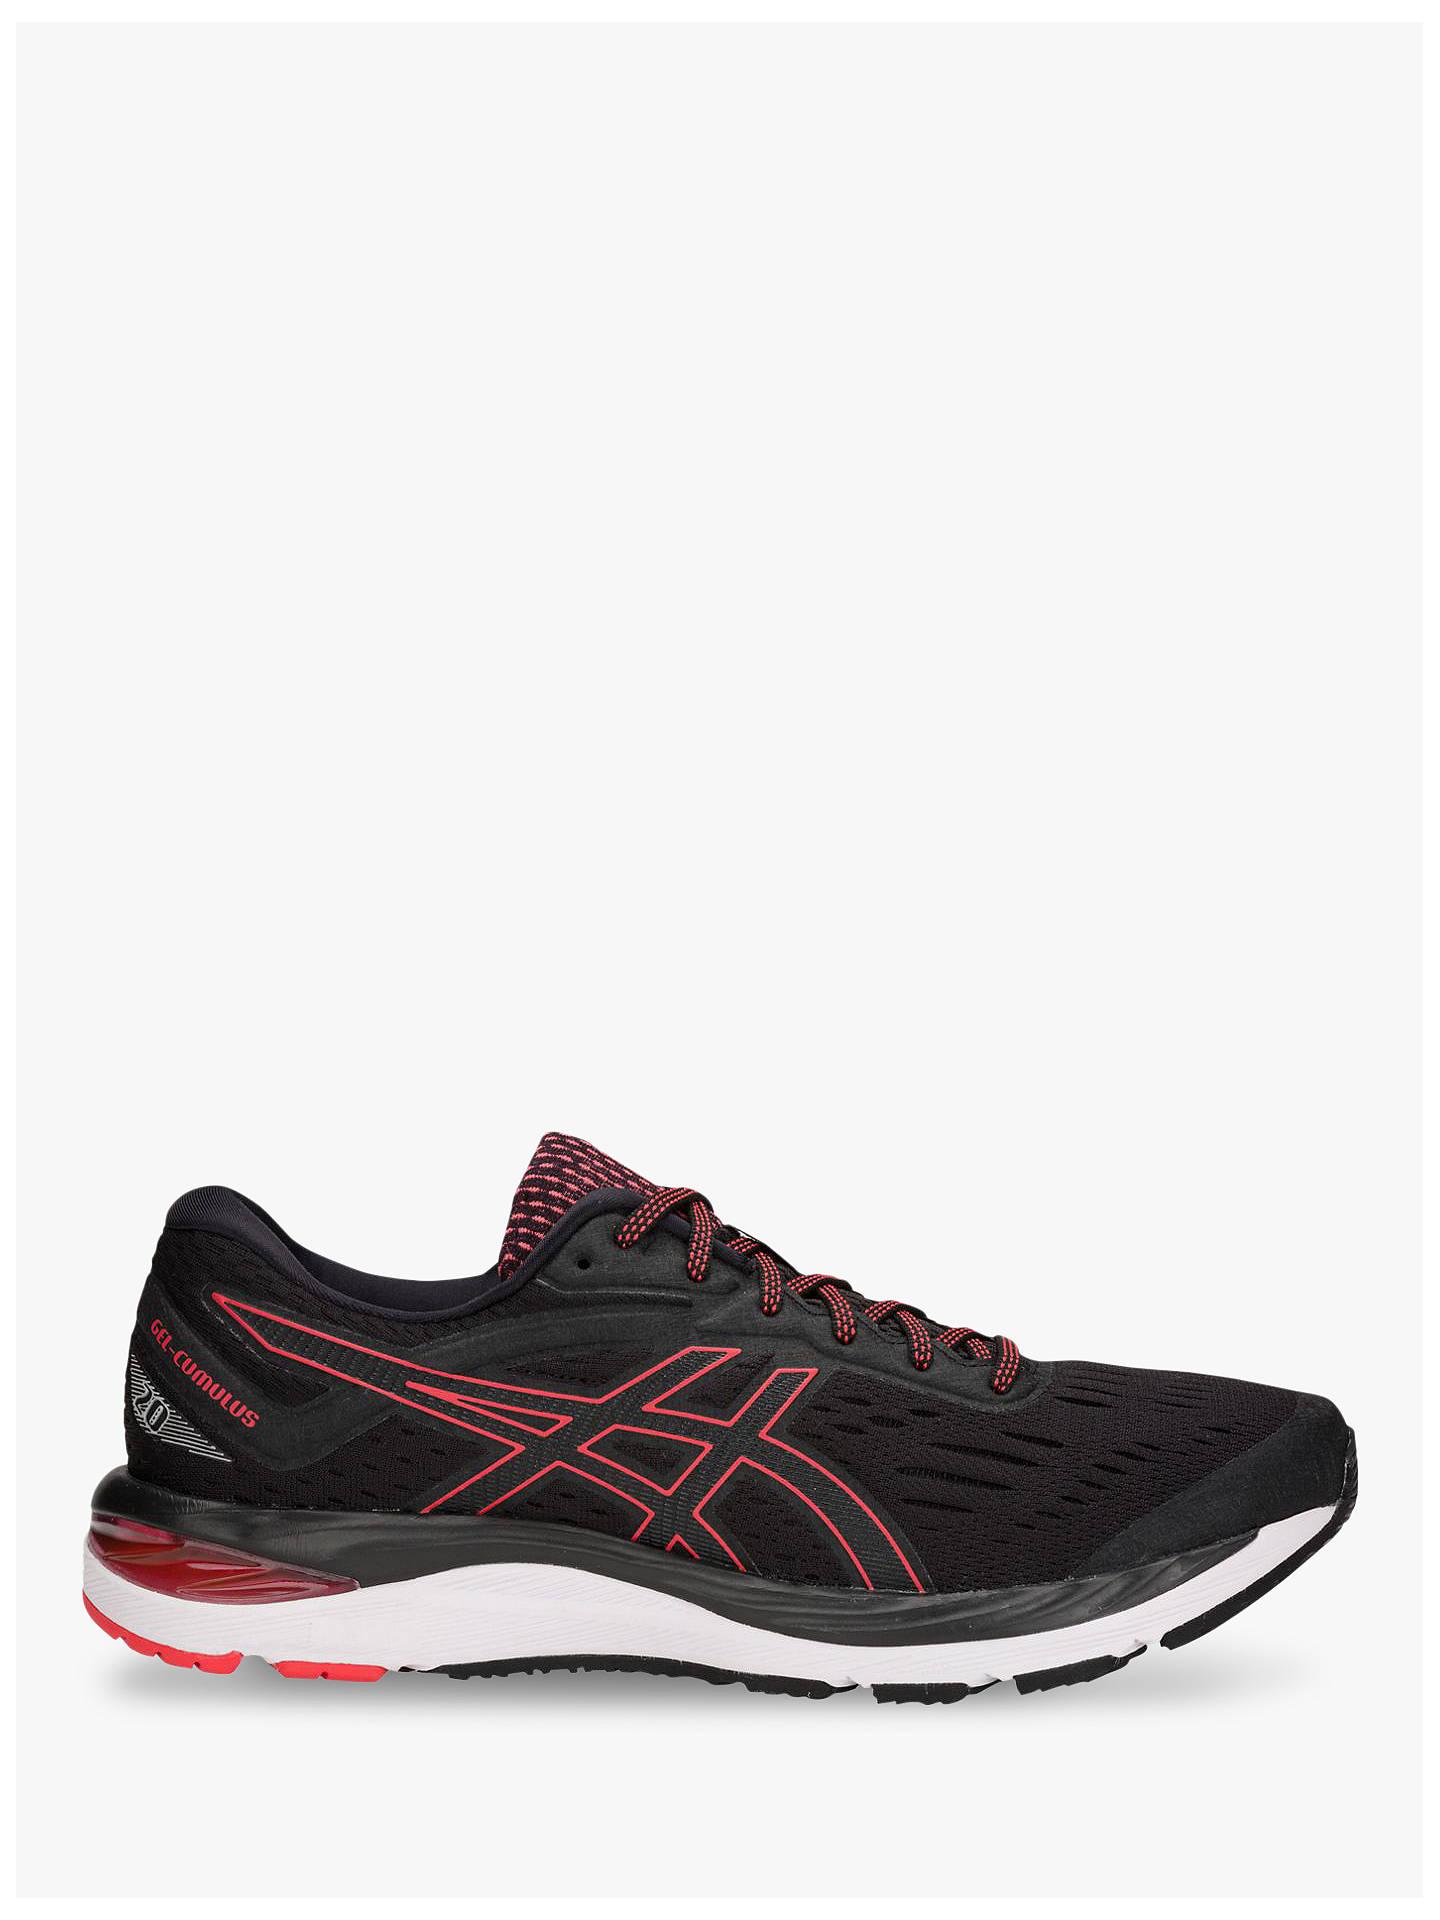 e6a17b399b Buy ASICS GEL-CUMULUS 20 Men's Running Shoes, Black/Alert Red, 8 ...